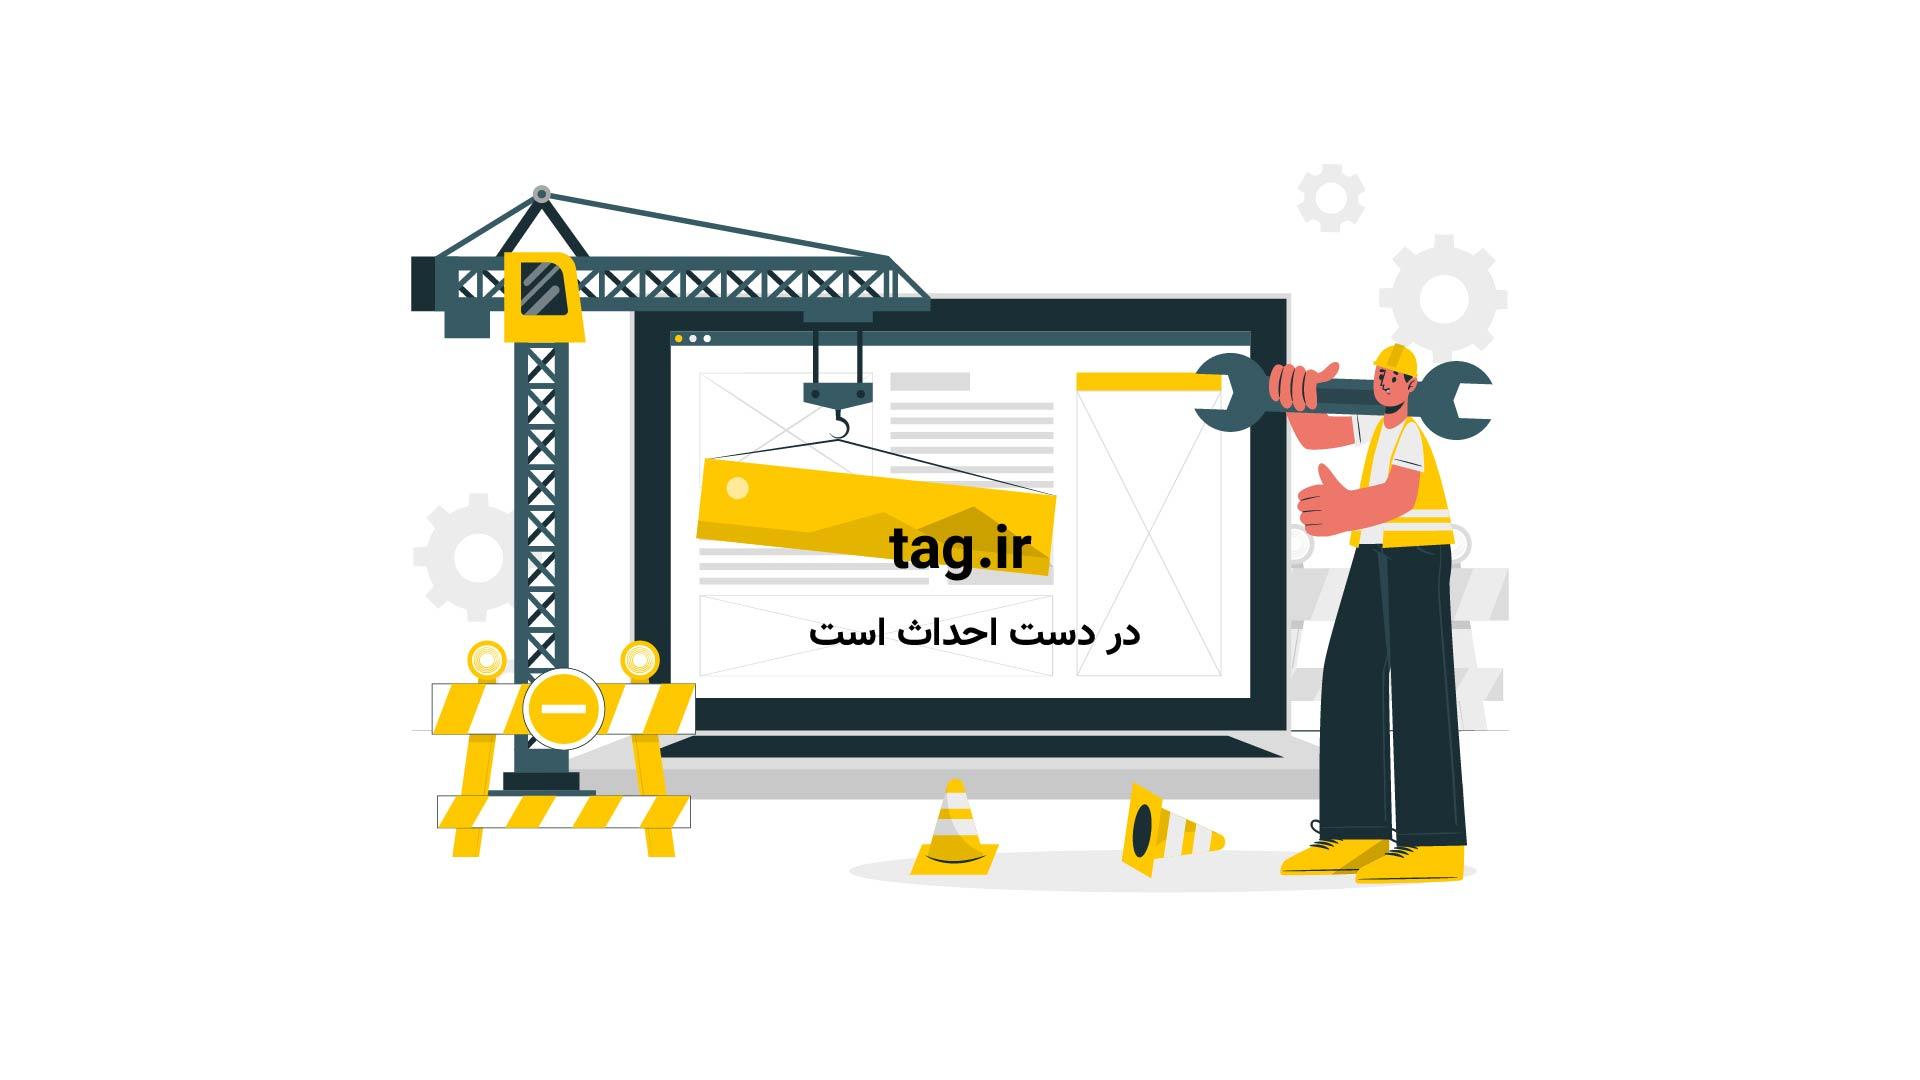 حیوانات | تگ